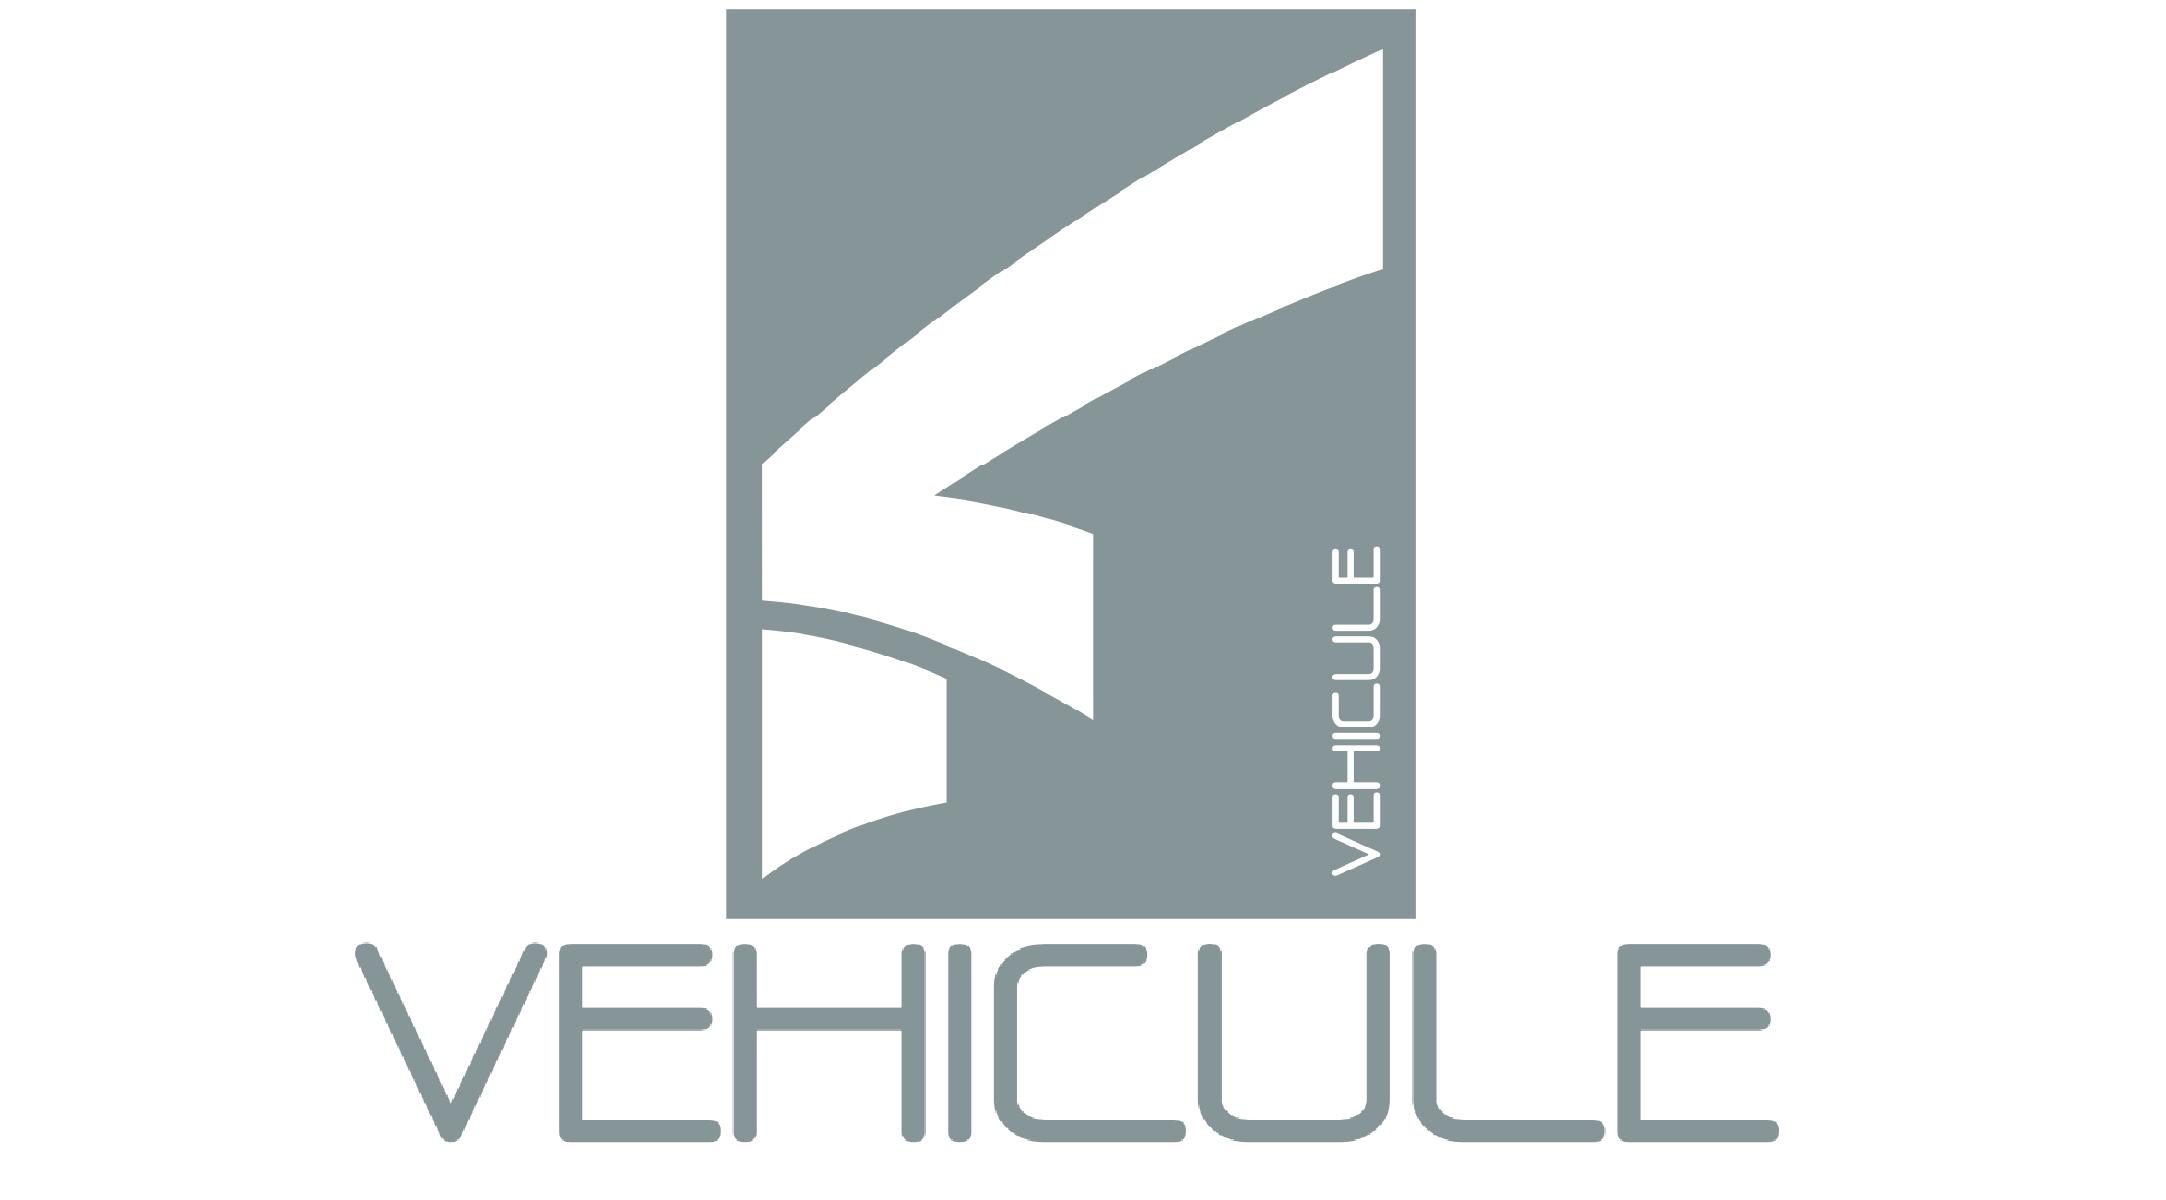 Activite vehicule